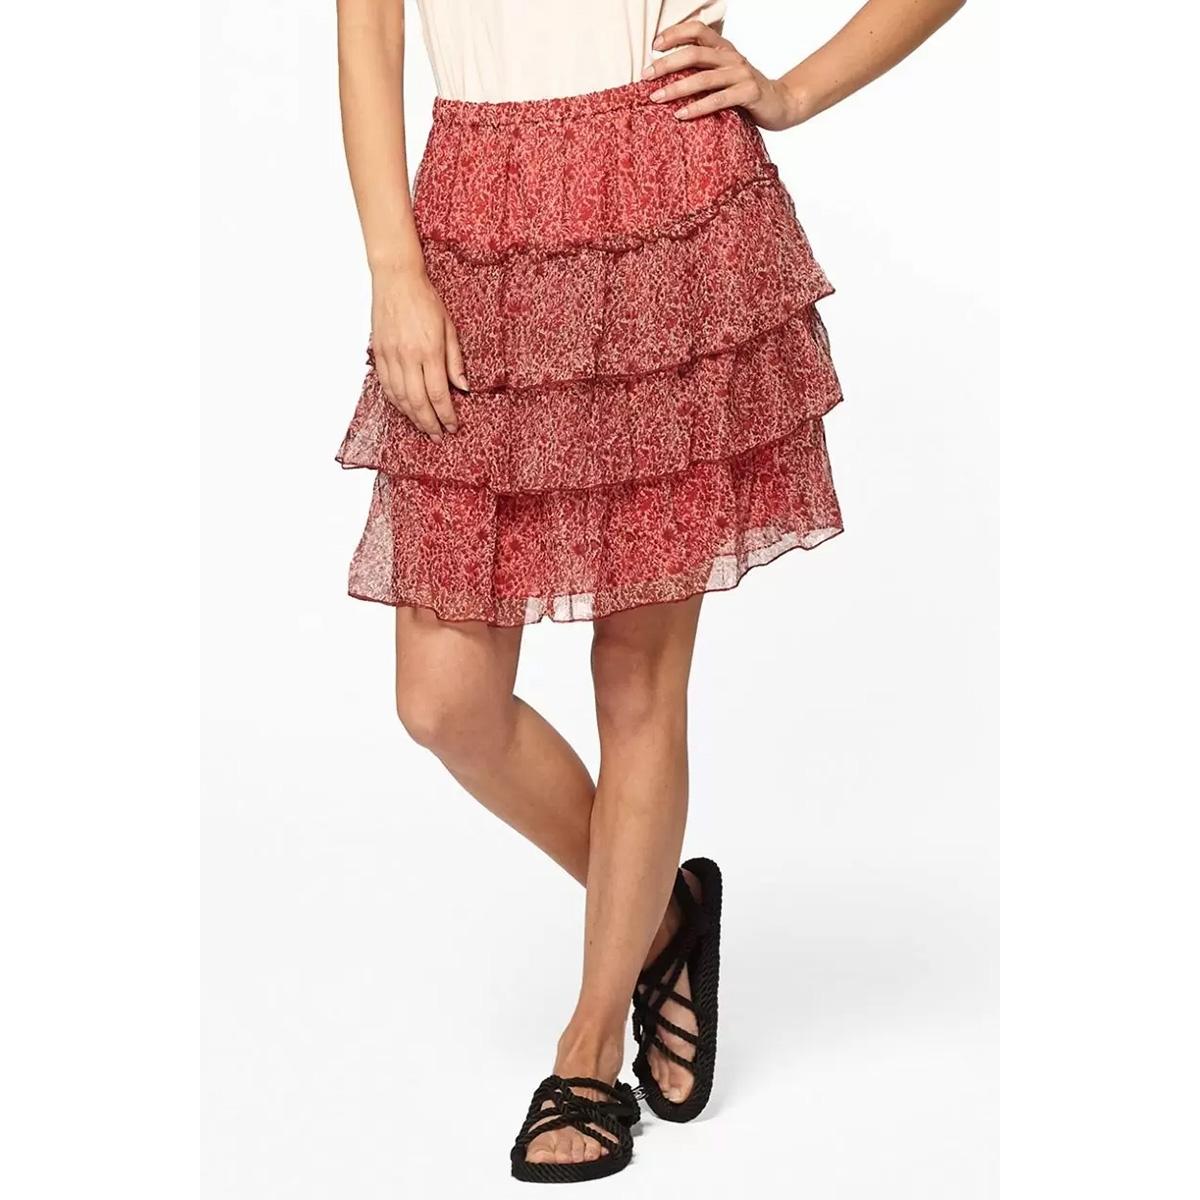 portta skirt s20 41 circle of trust rok 3055 red tree